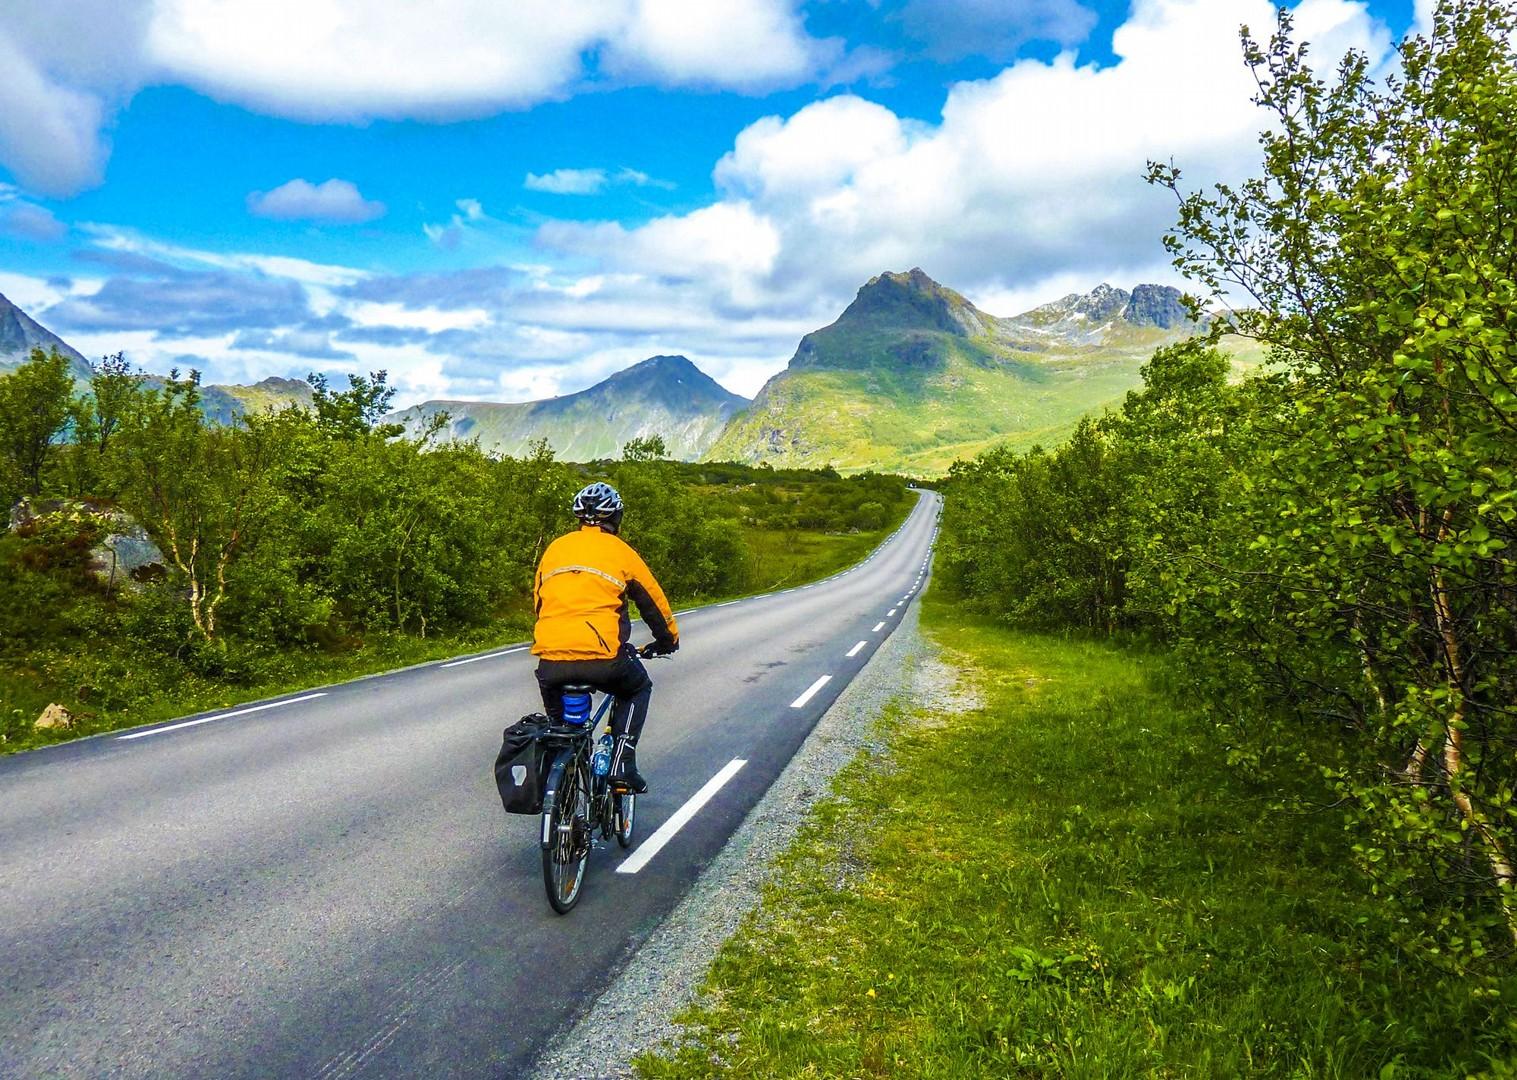 cycling-on-roads-norway-europe-lofoten-islands-self-guided.jpg - Norway - Lofoten Islands - Self-Guided Leisure Cycling Holiday - Leisure Cycling